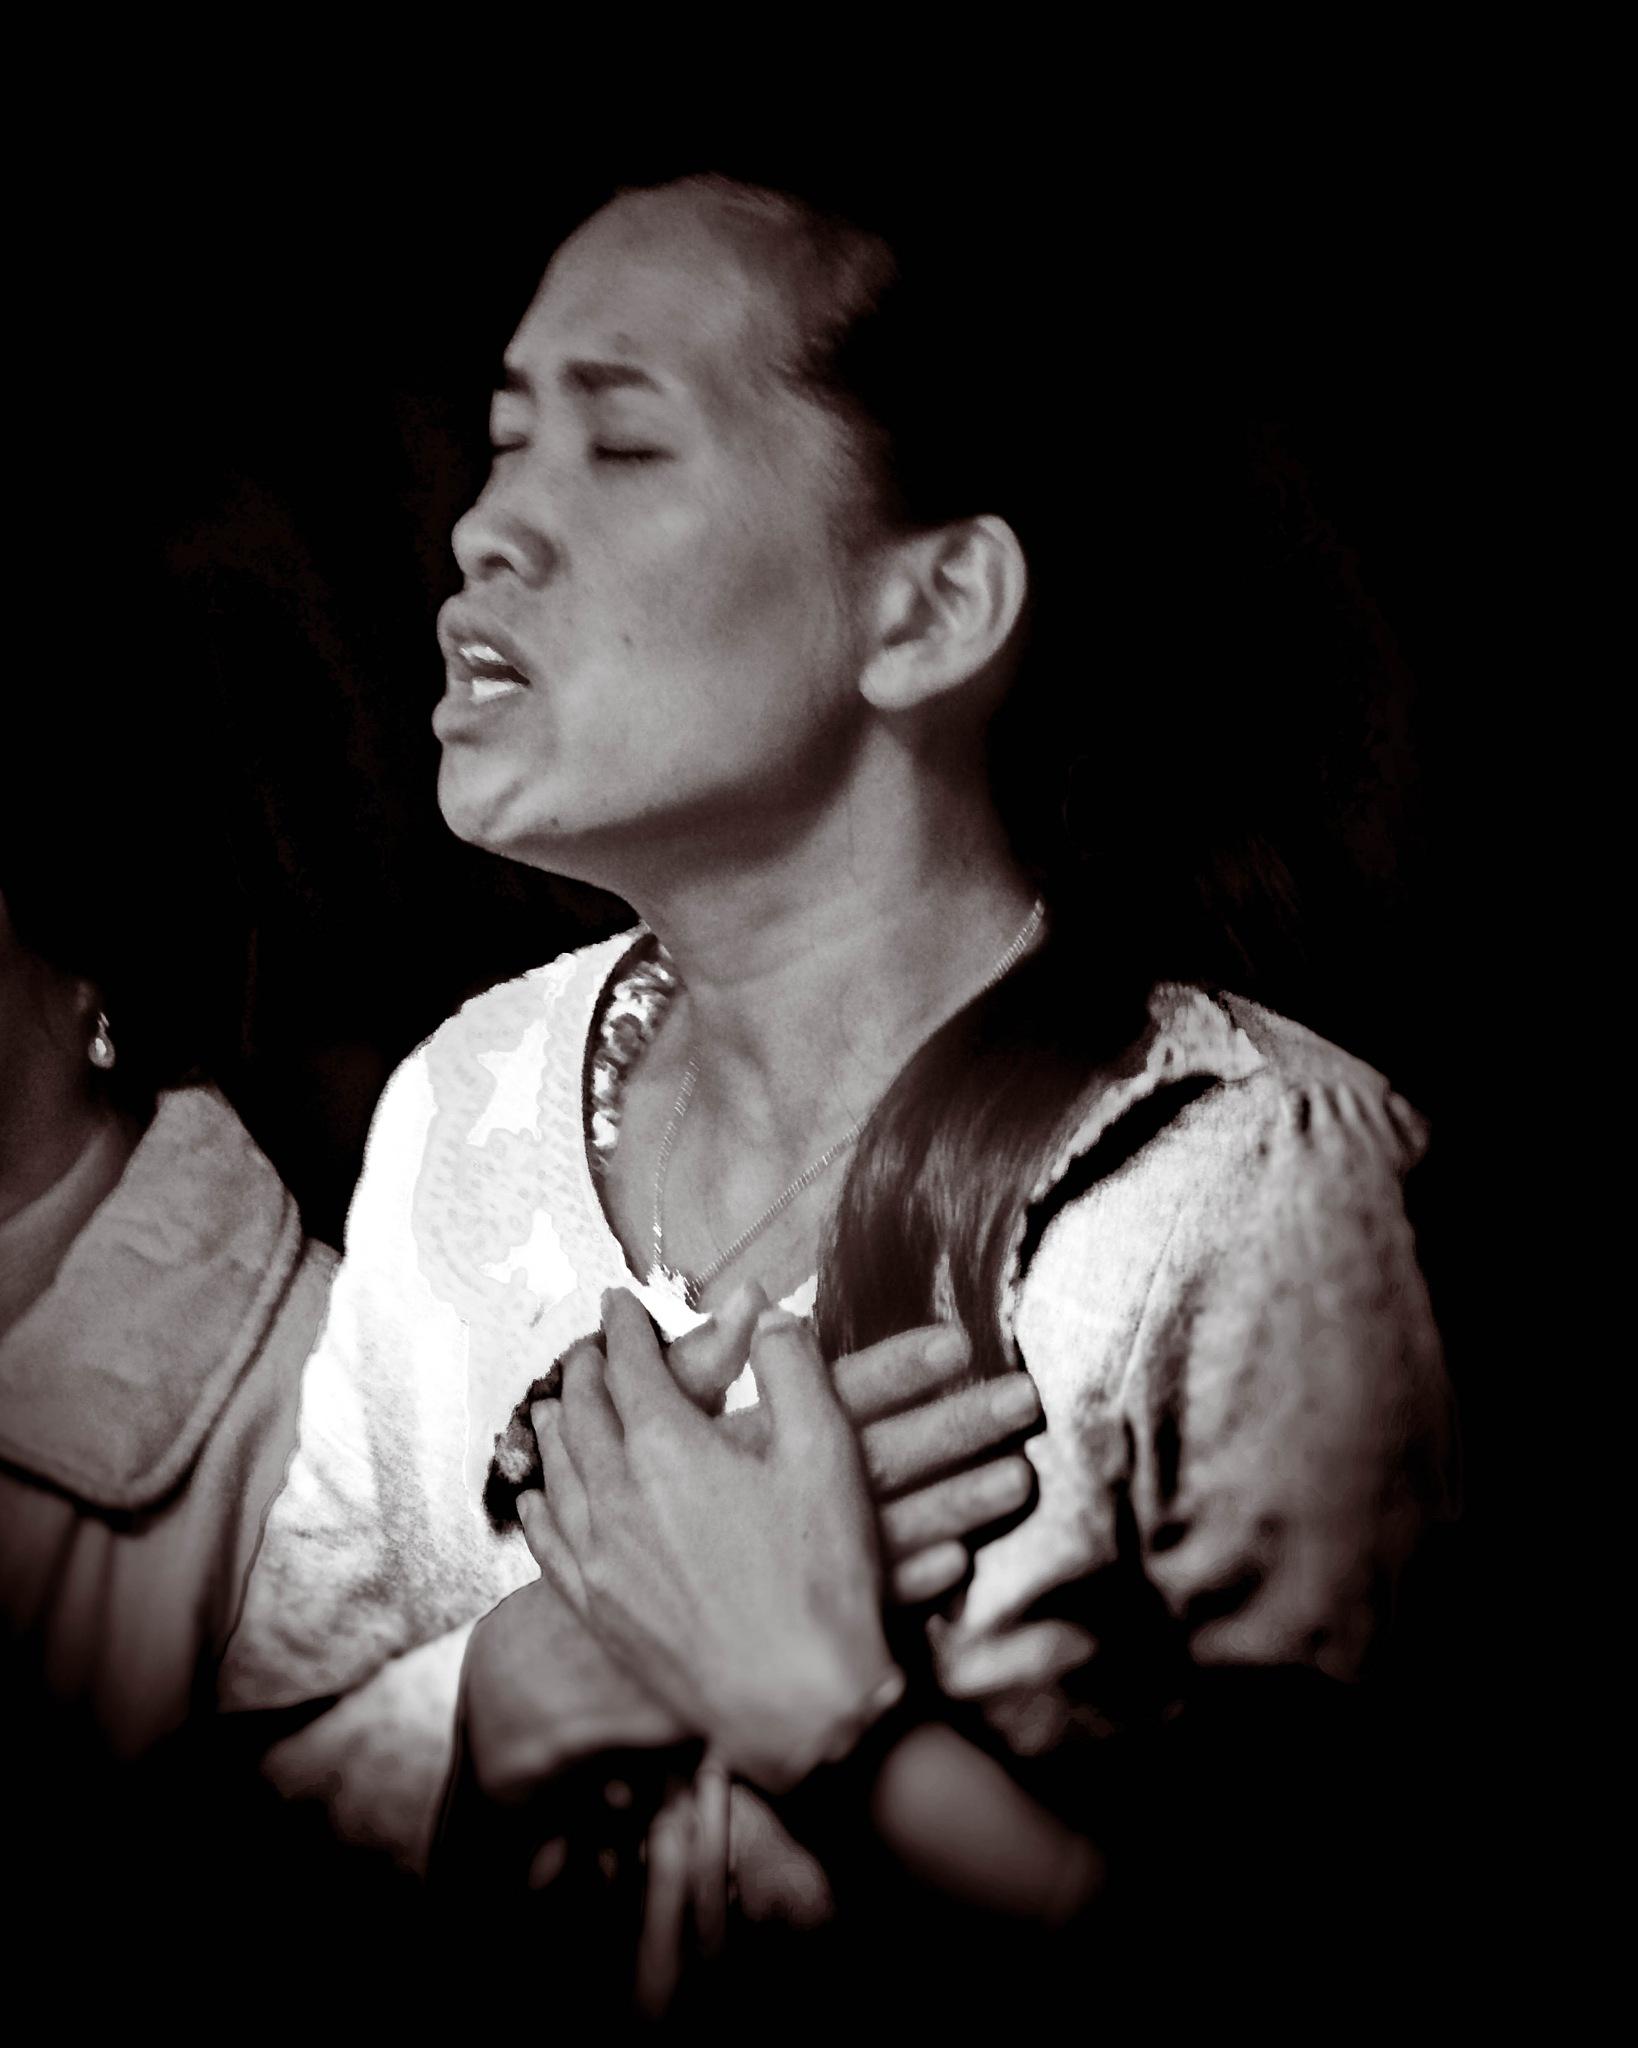 Devotion by Frank Brande